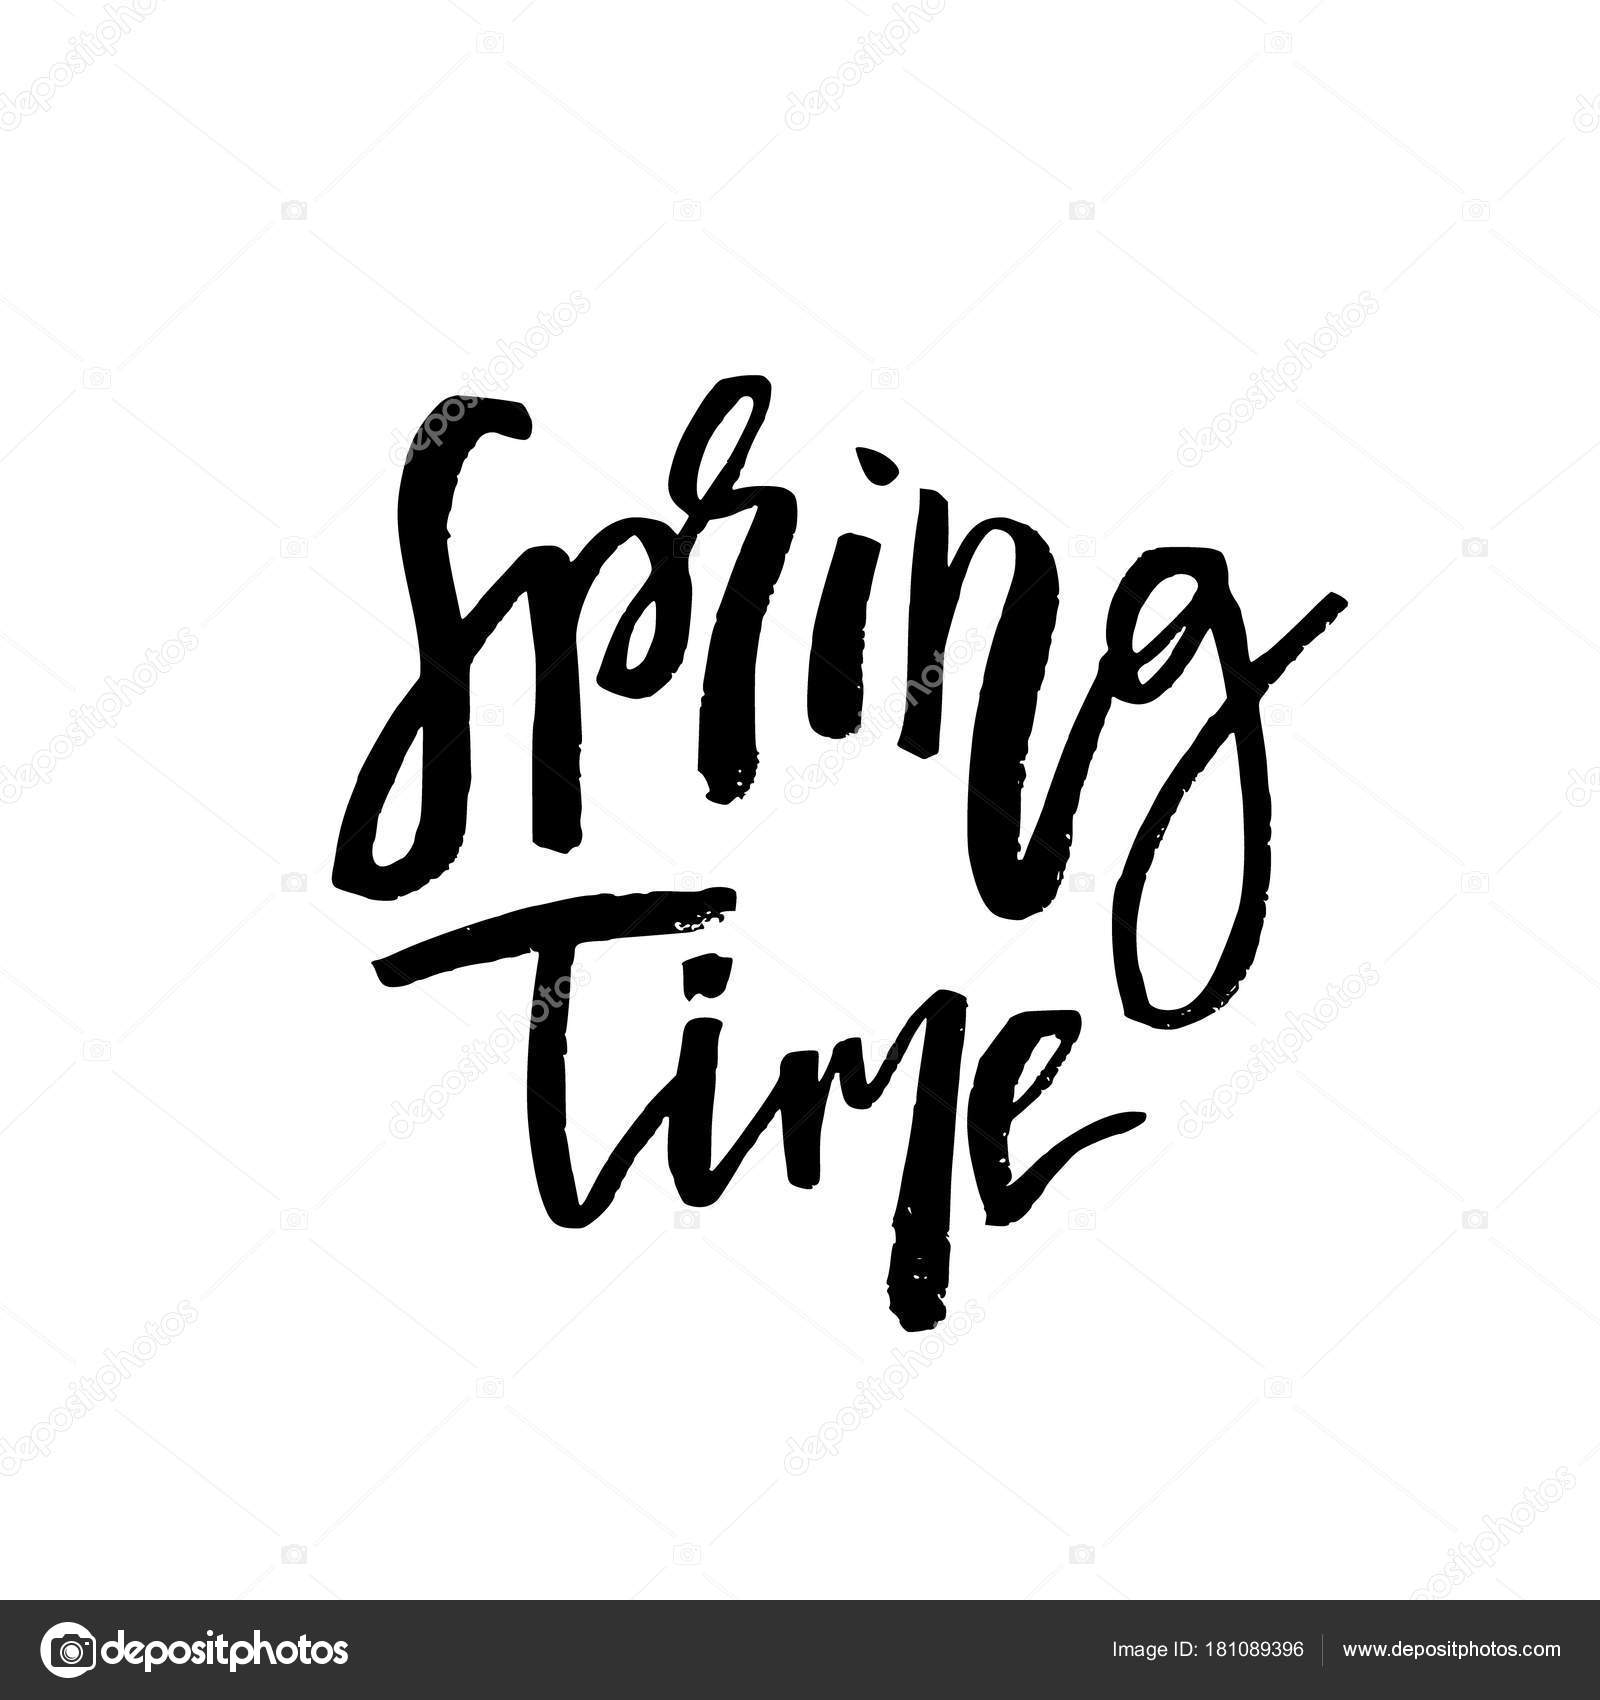 Frühjahr Hand Angebot Inspirieren Lassen Vektor Typografie De